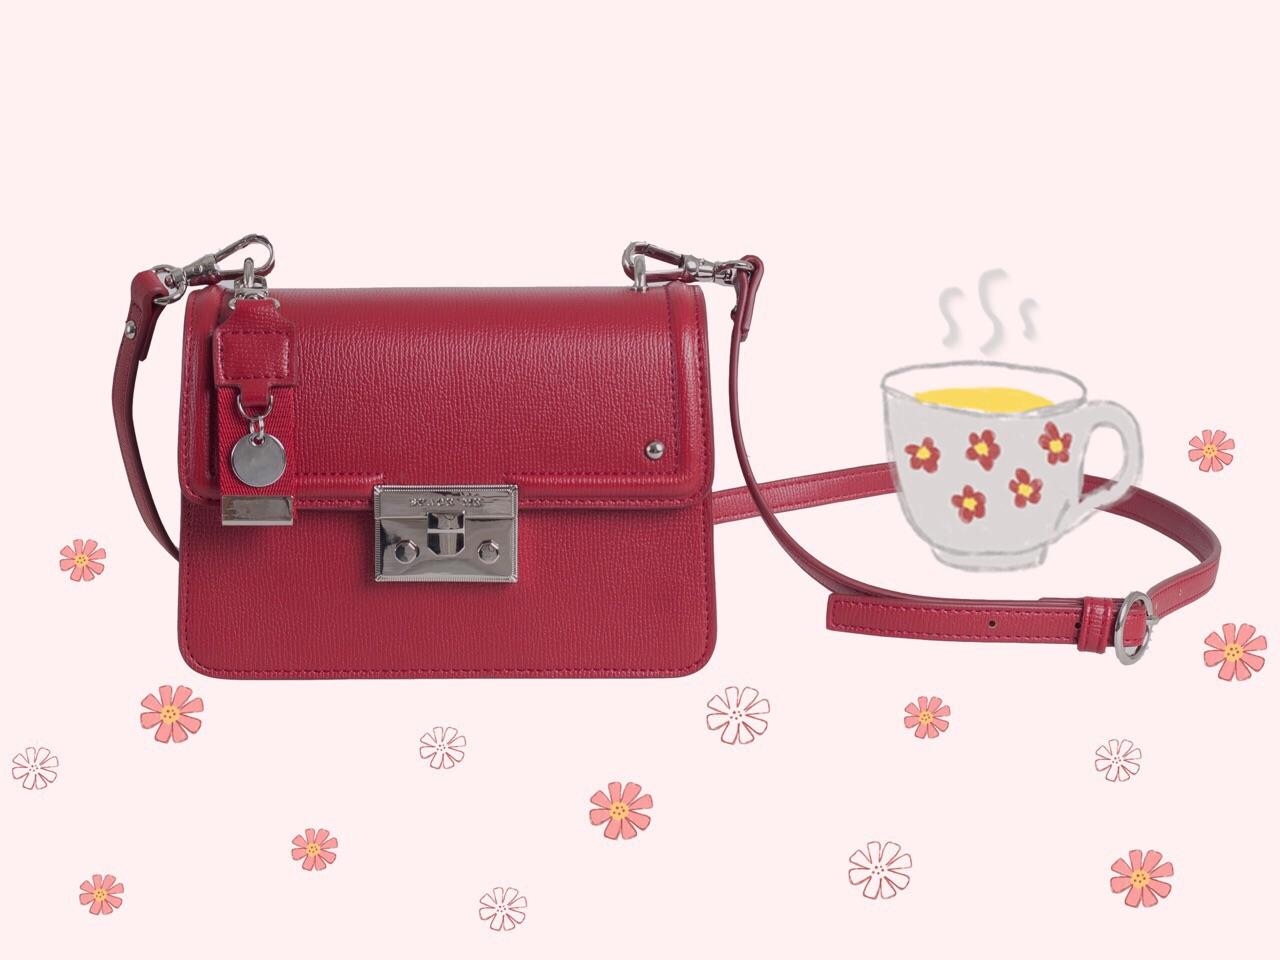 SPACEME,กระเป๋า,กระเป๋าผู้หญิง,กระเป๋าถือ,กระเป๋าสะพาย,กระเป๋าหนัง,กระเป๋าใบเล็ก